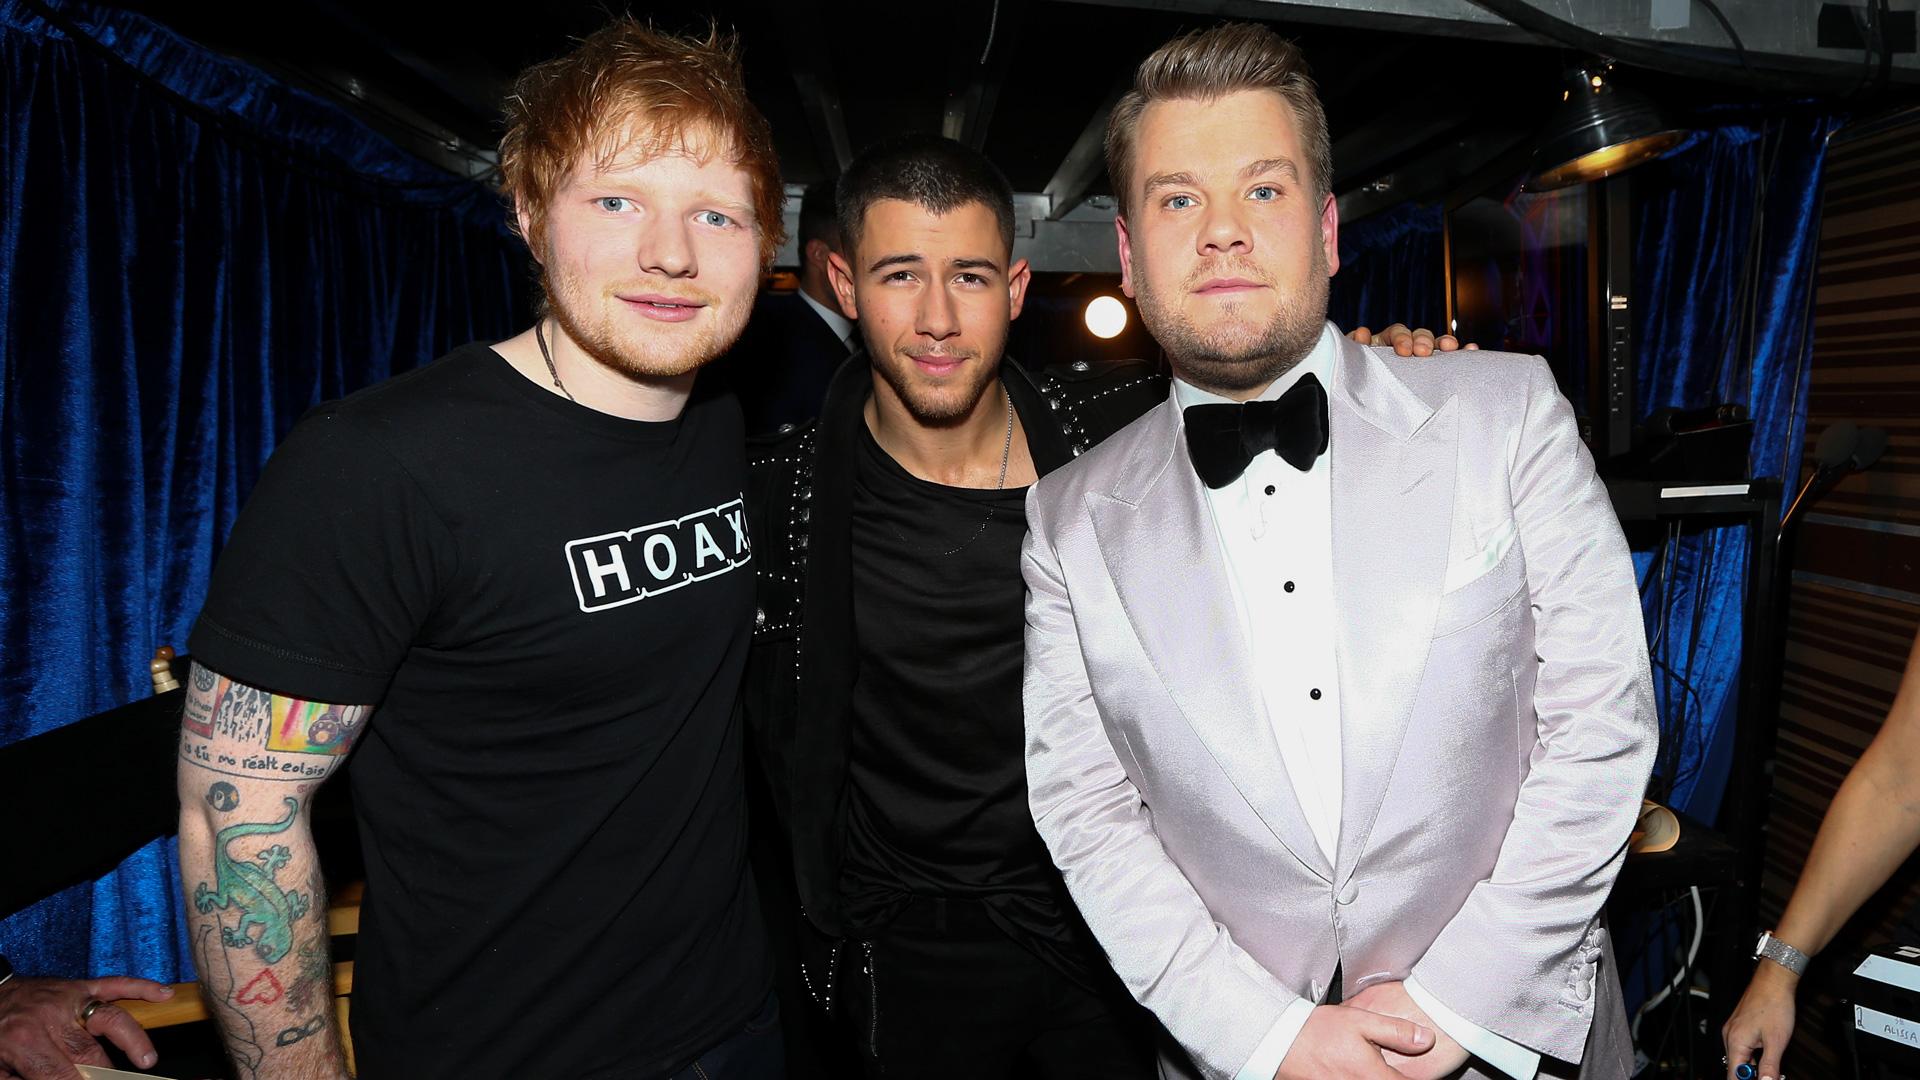 Ed Sheeran and Nick Jonas join 2017 GRAMMY host James Corden backstage.